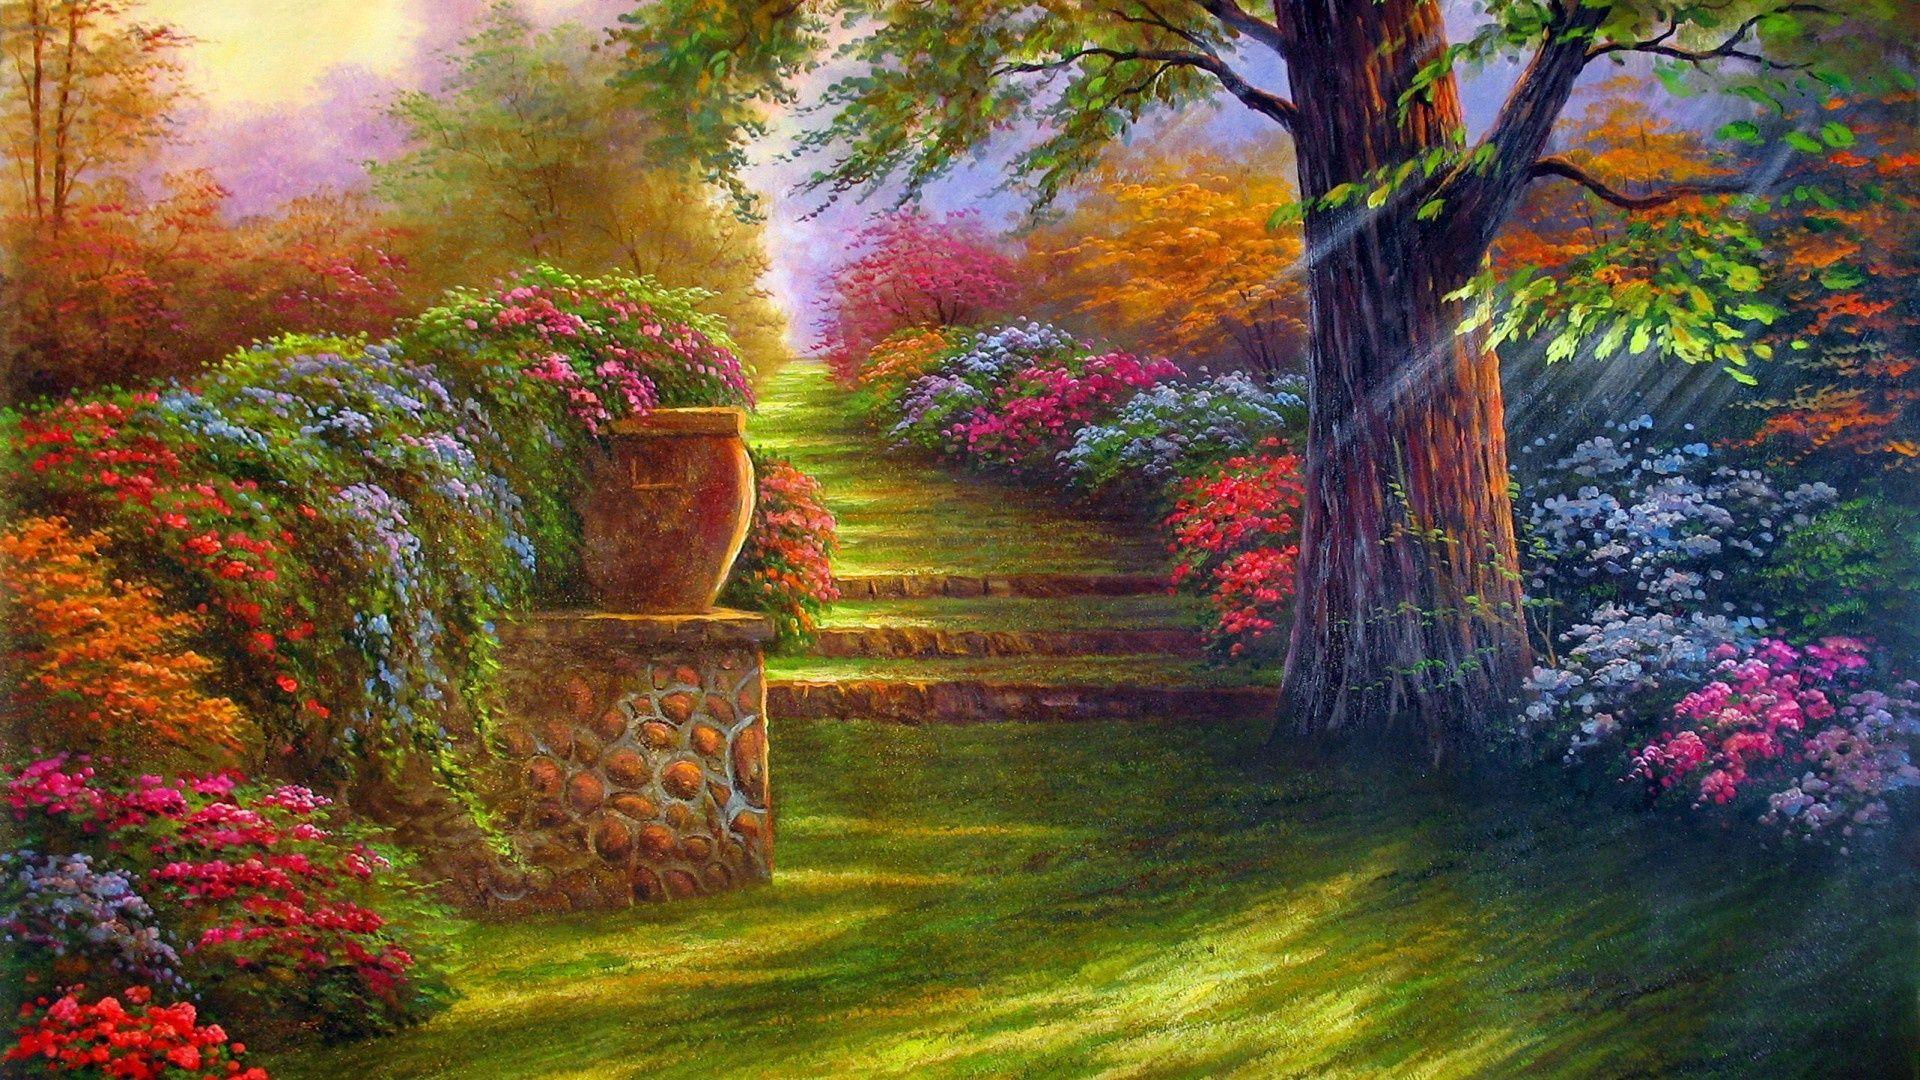 flower gardens wallpaper (With images) Landscape